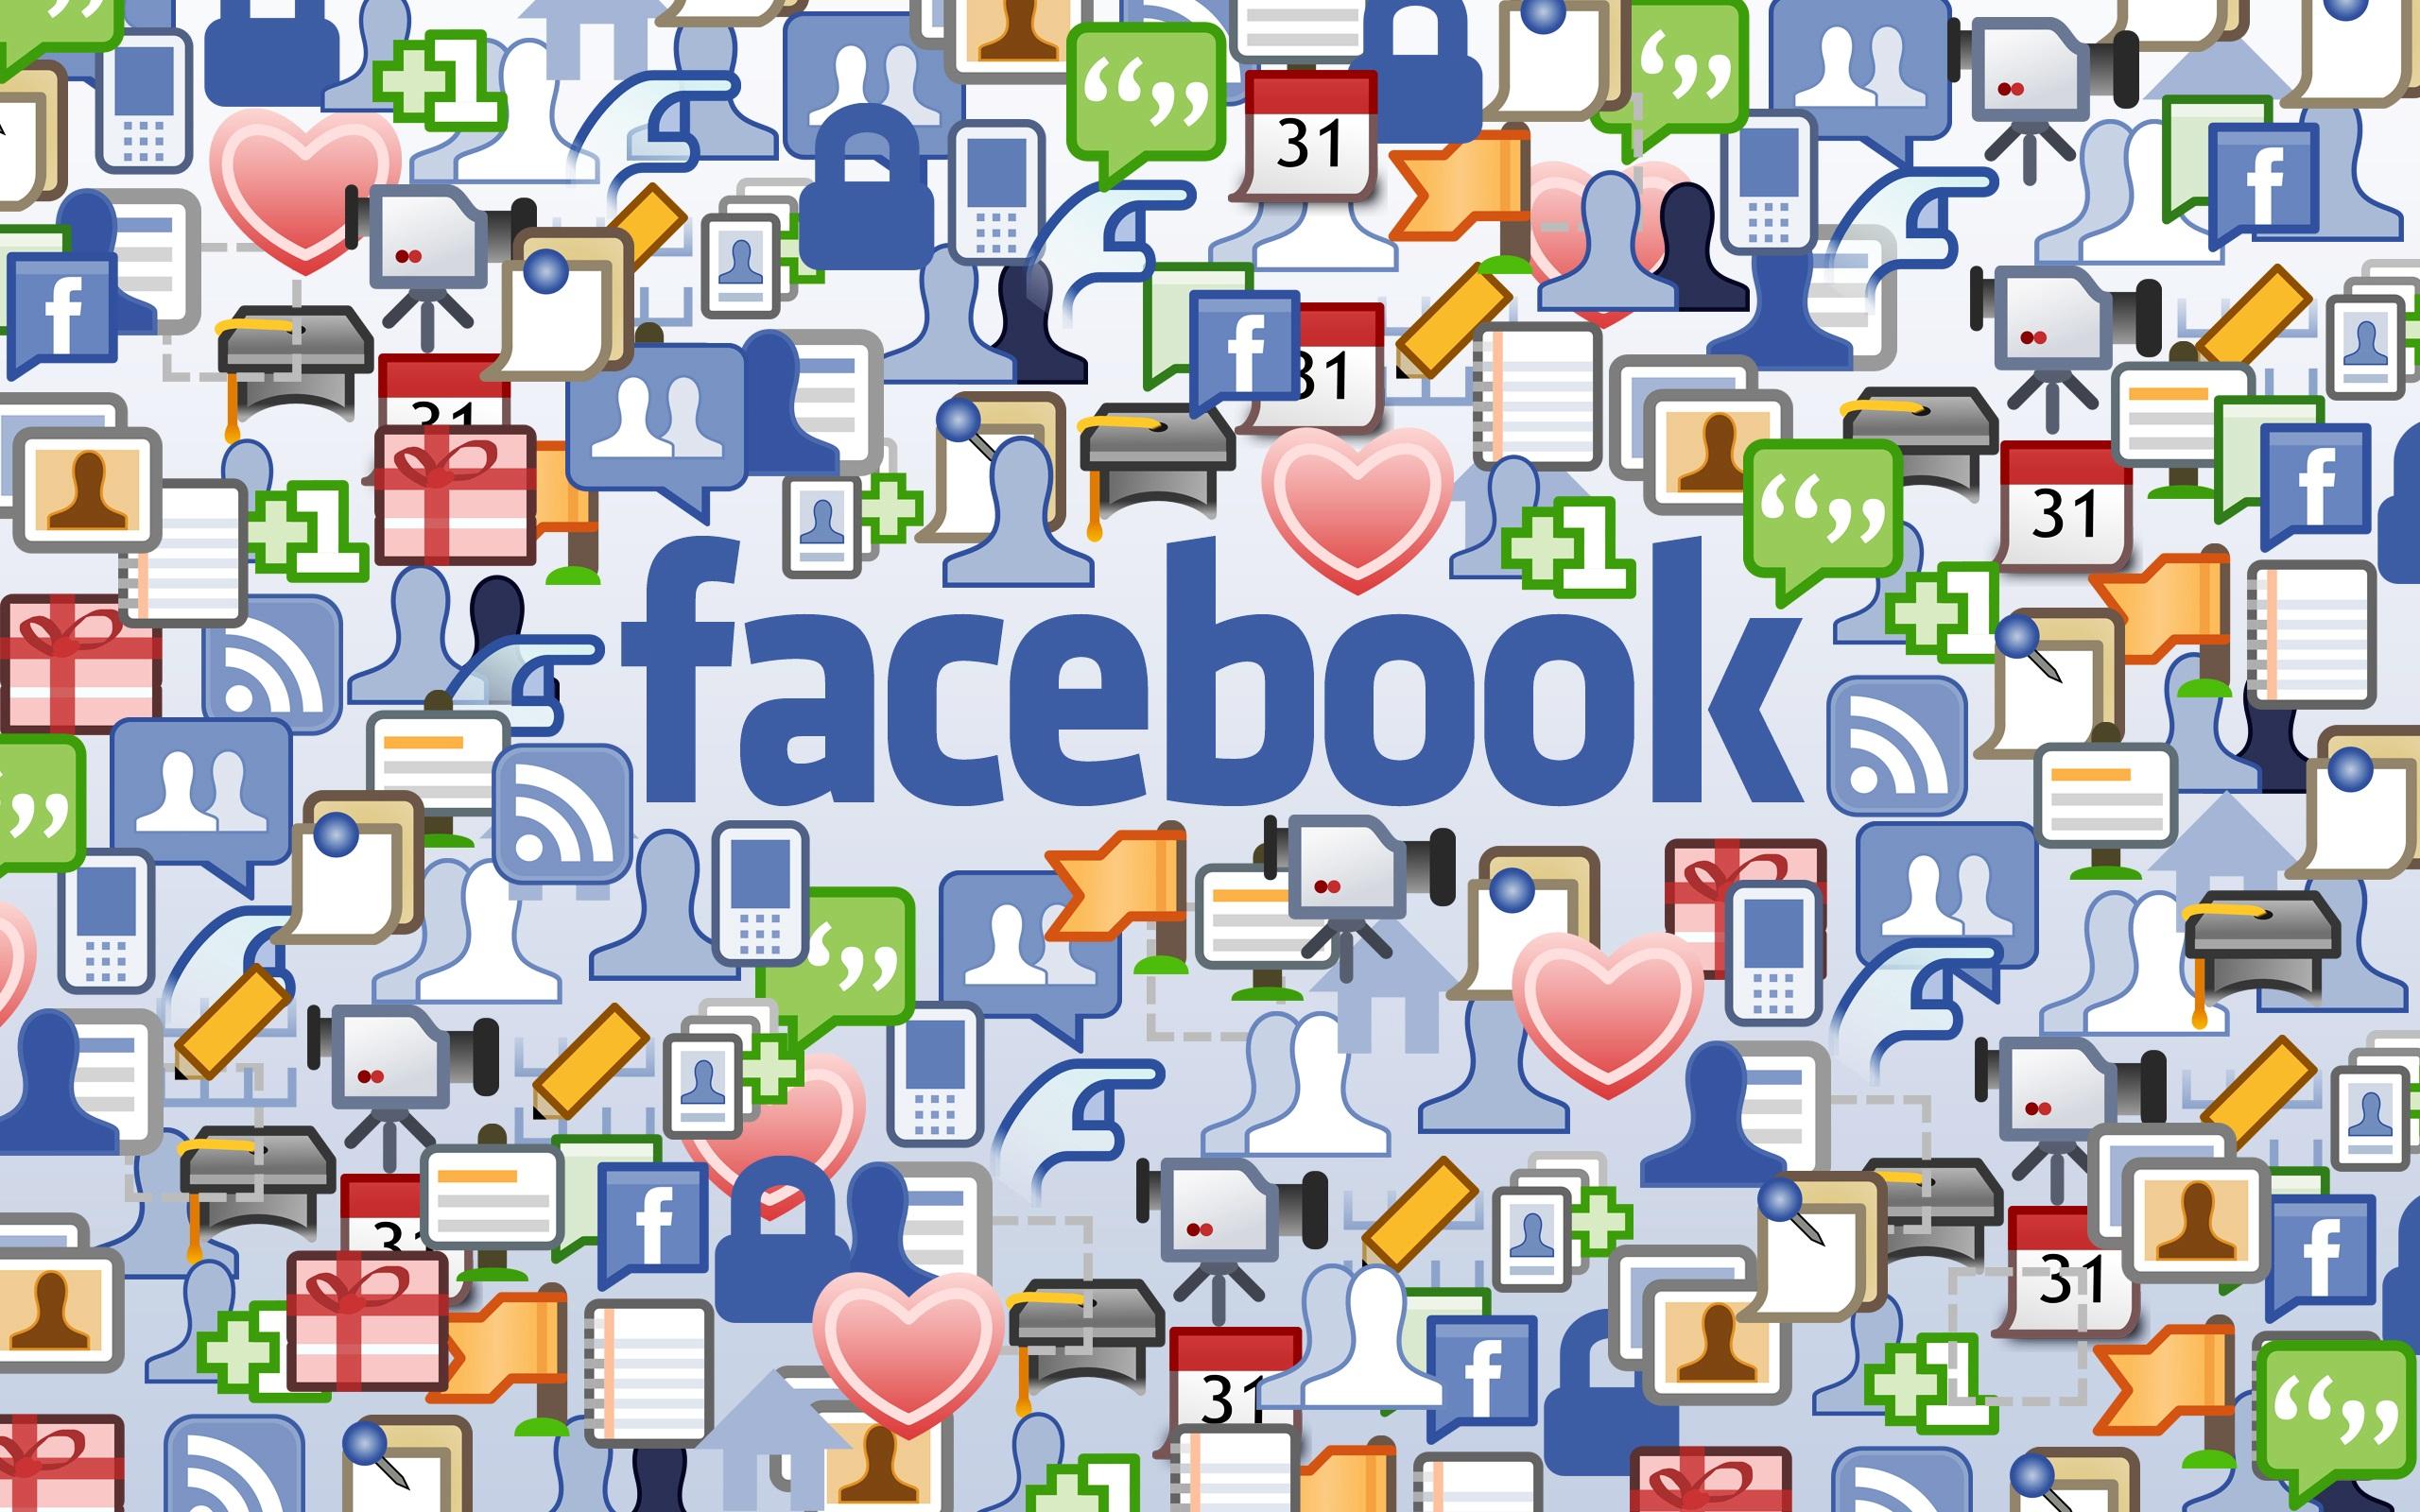 Facebook2195416581 - Facebook - Facebook, Chip